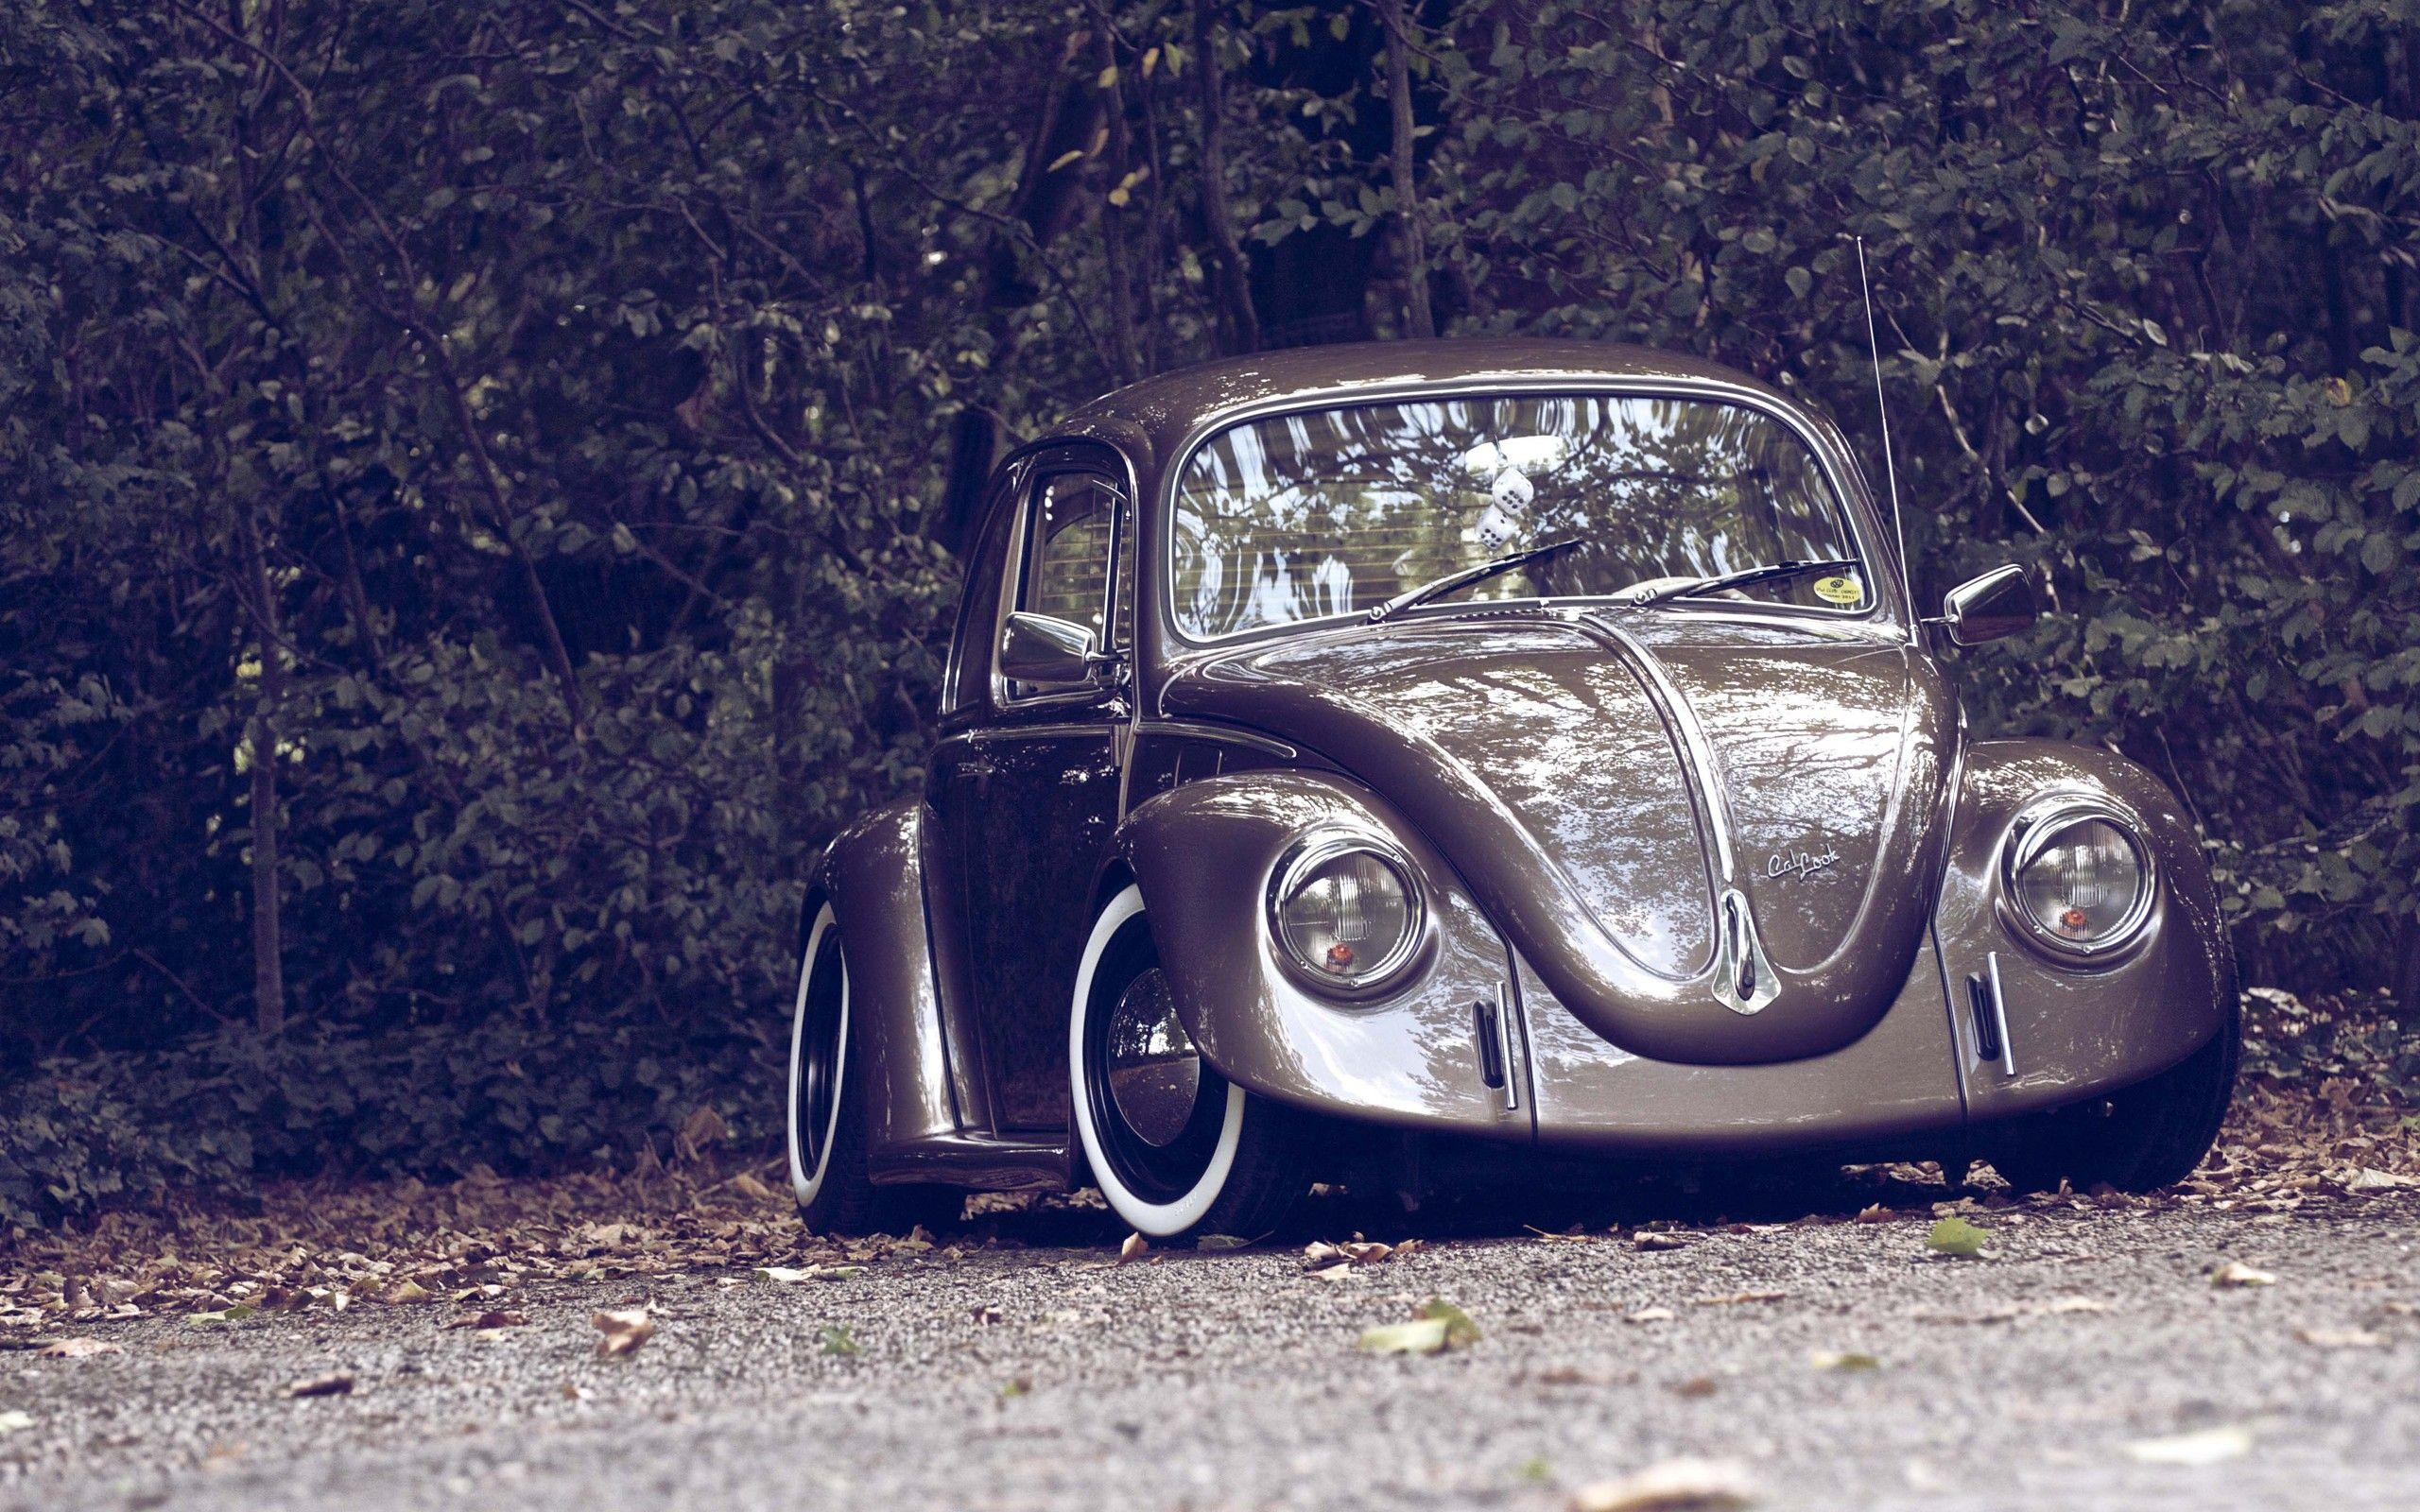 Volkswagen Beetle Wallpaper For Mac hZq VW Custom cars Beetle 2560x1600